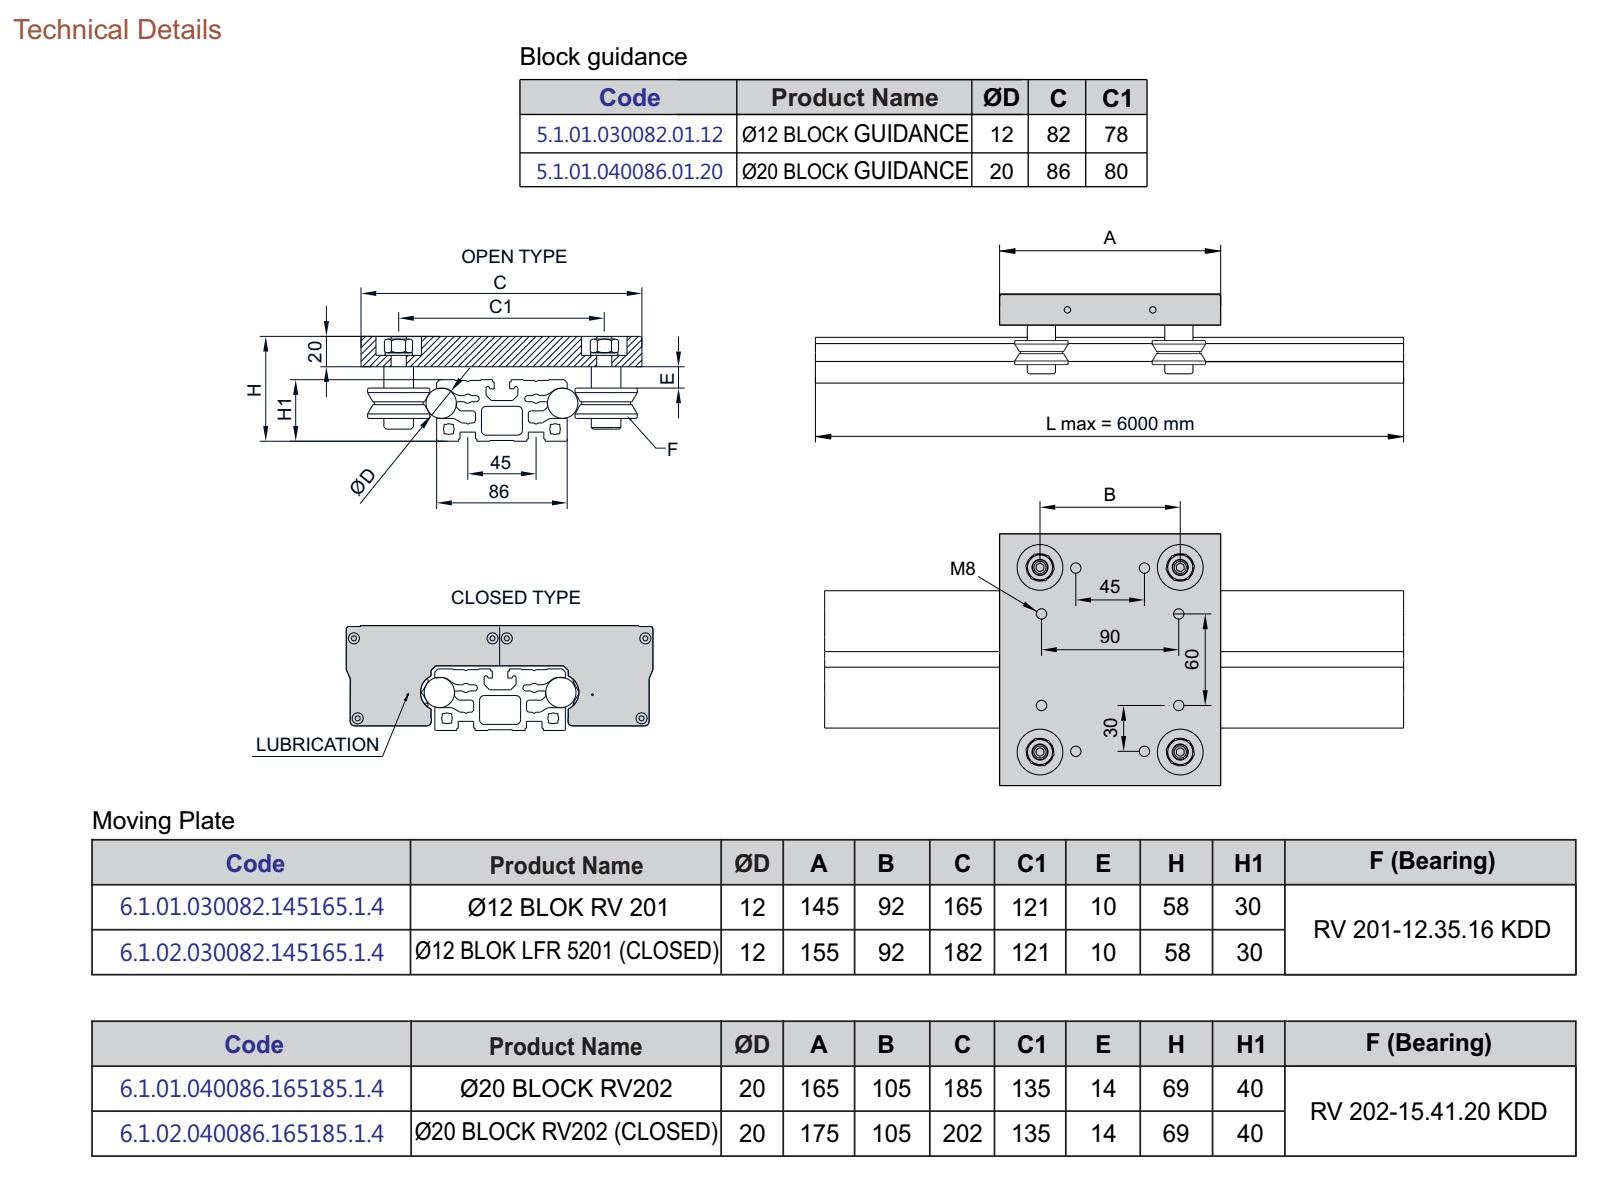 Linear Motion System 12 20 Mm Block Guidance Elega Diagram 5